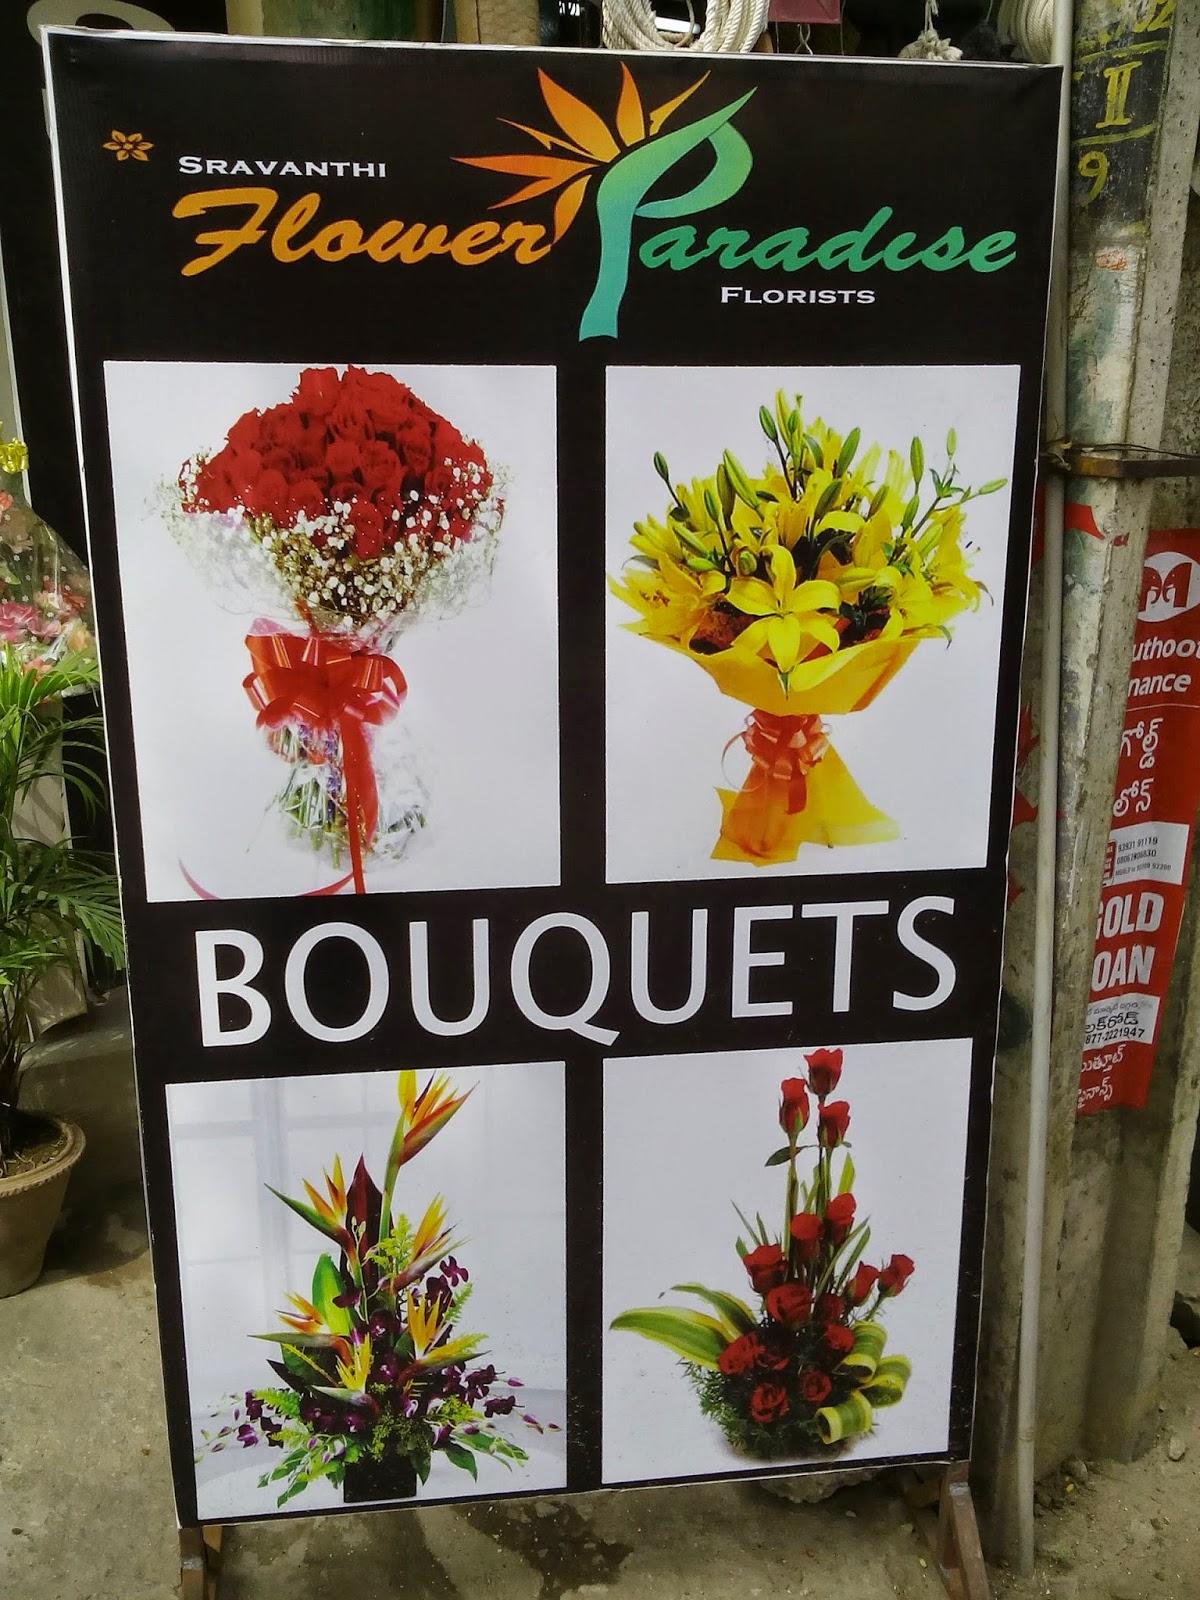 Sravanthi Flower Paradise Tirupati